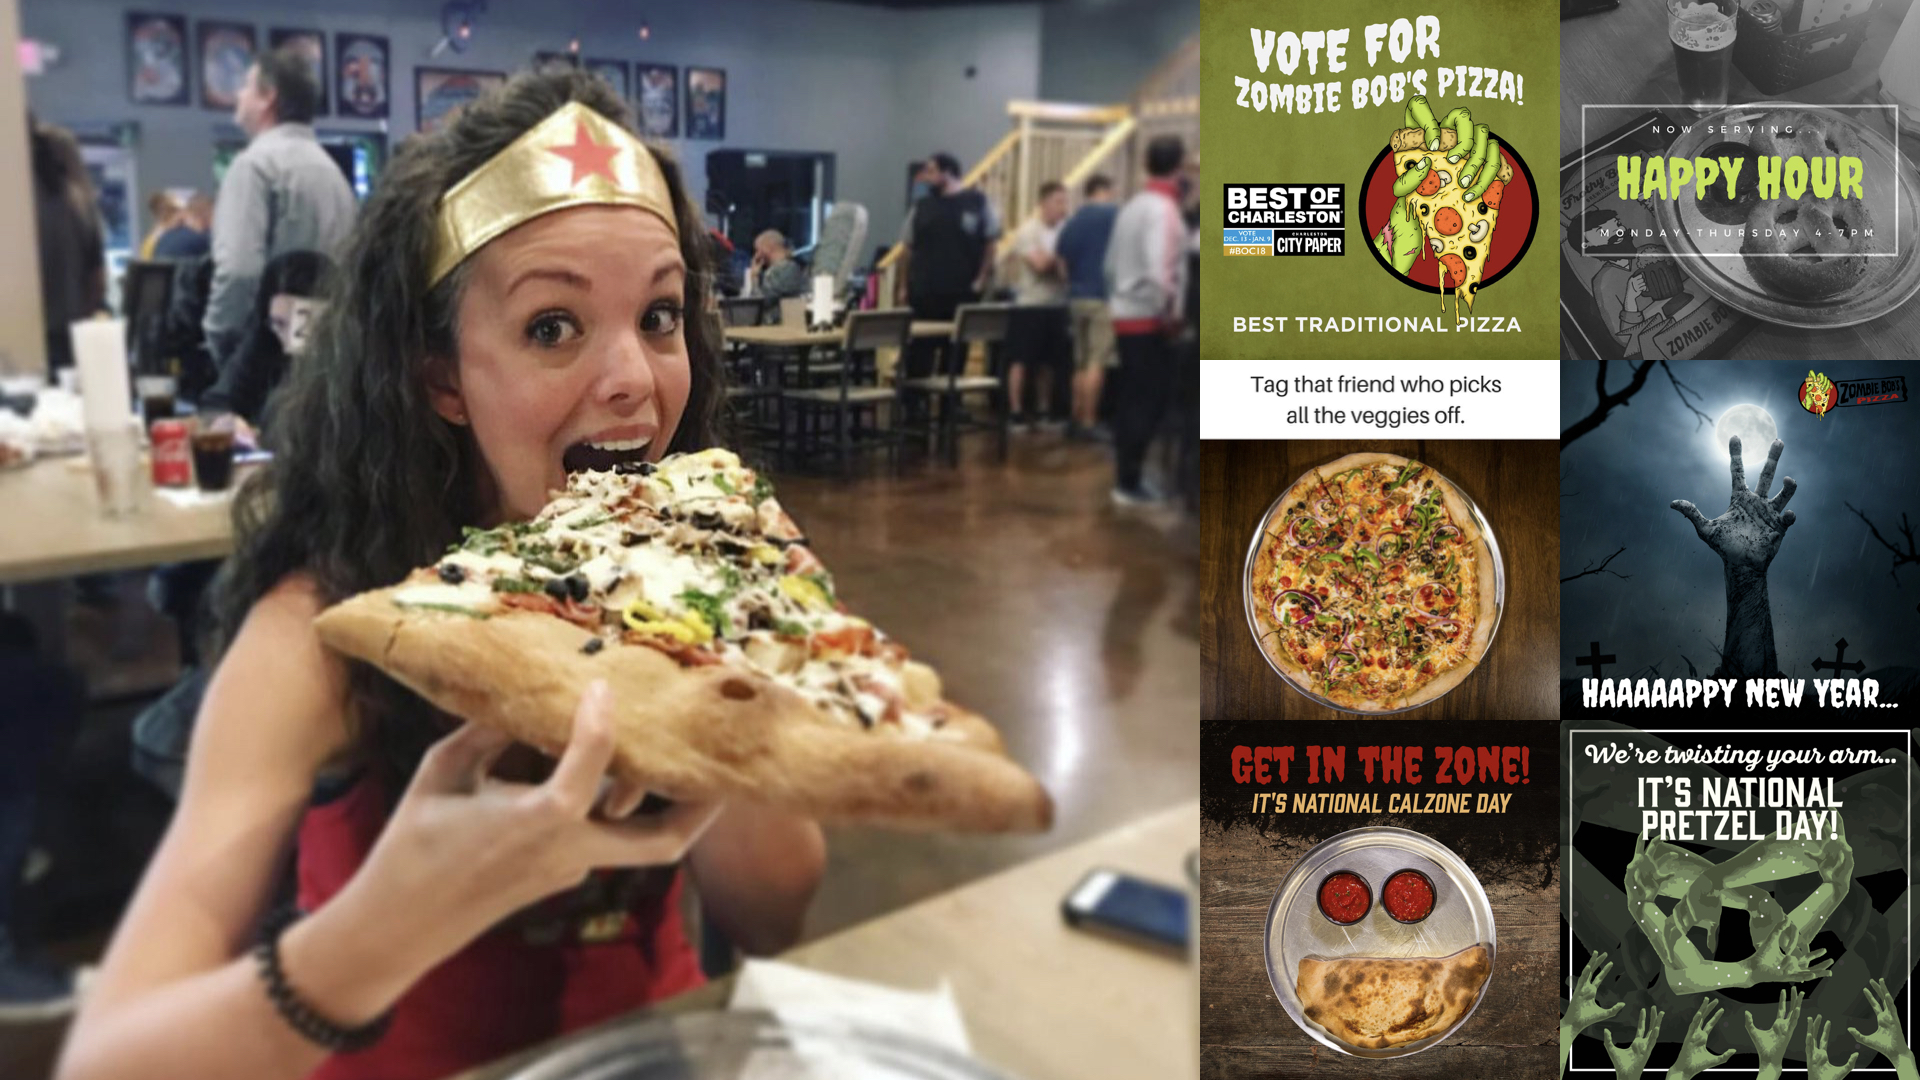 Zombie Bob's Pizza